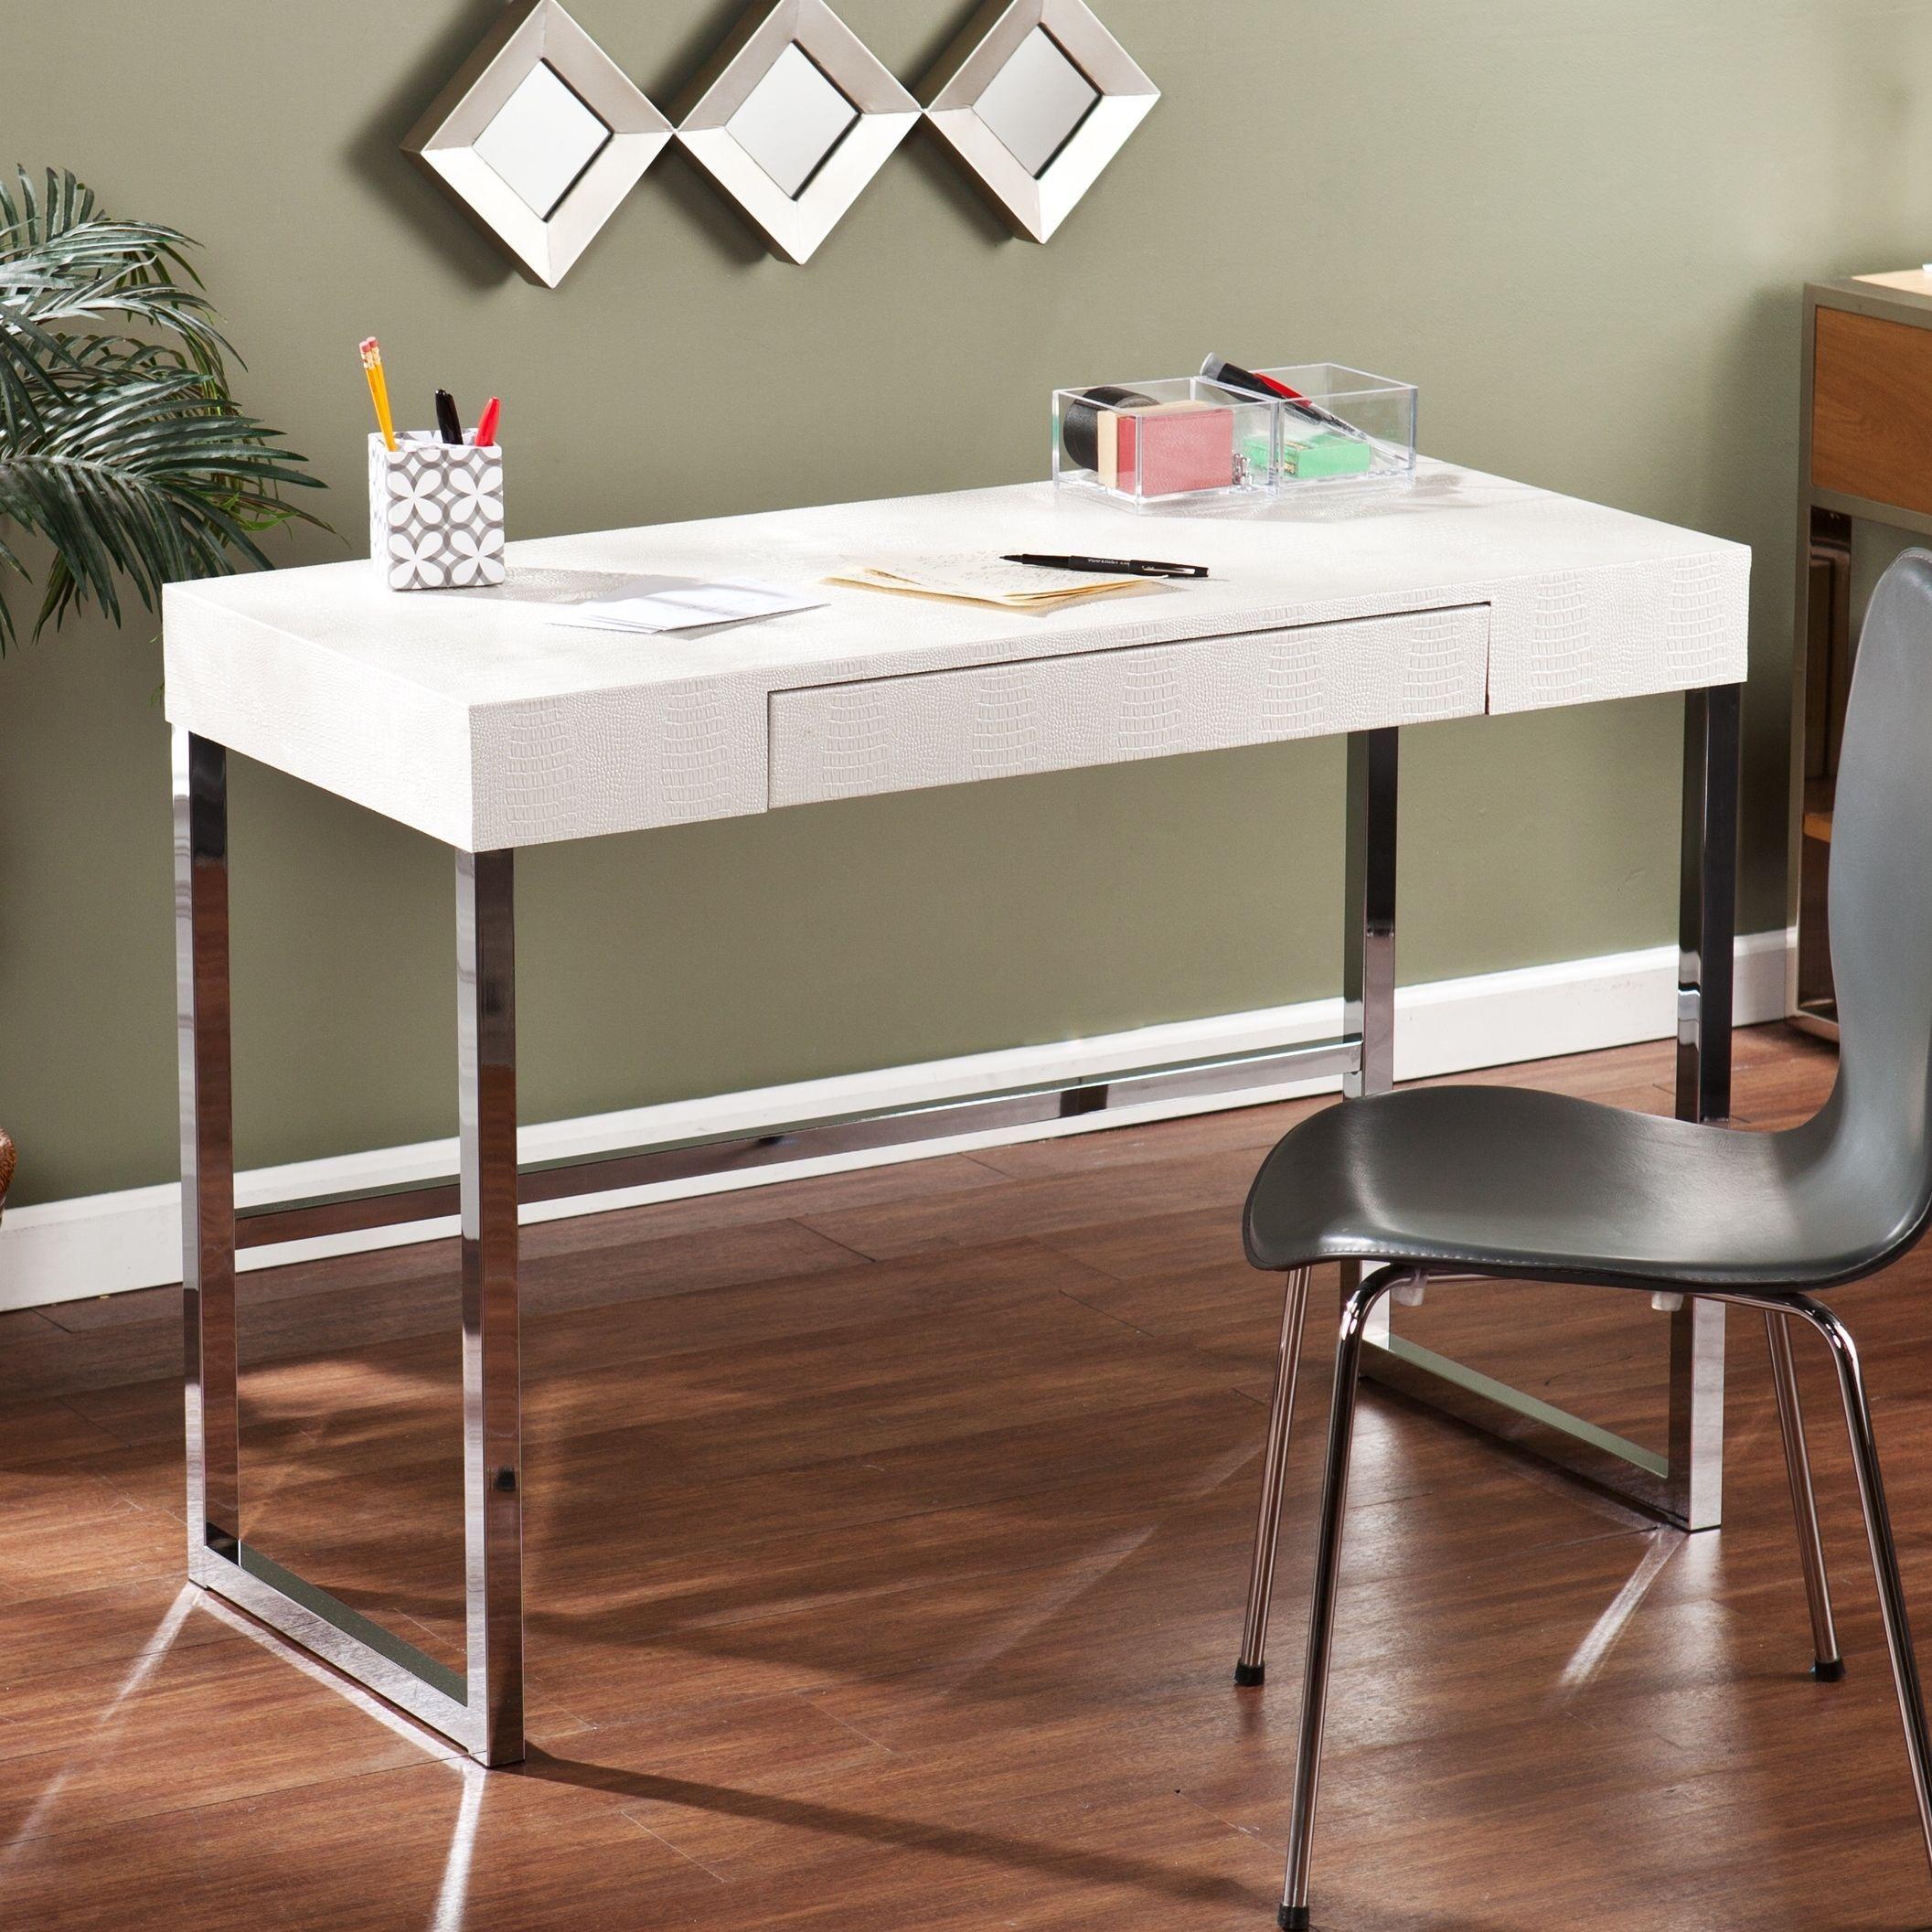 Gentil $239.99 Upton Home Vivica Cream Reptile Contemporary Desk   Overstock  Shopping   Great Deals On Upton